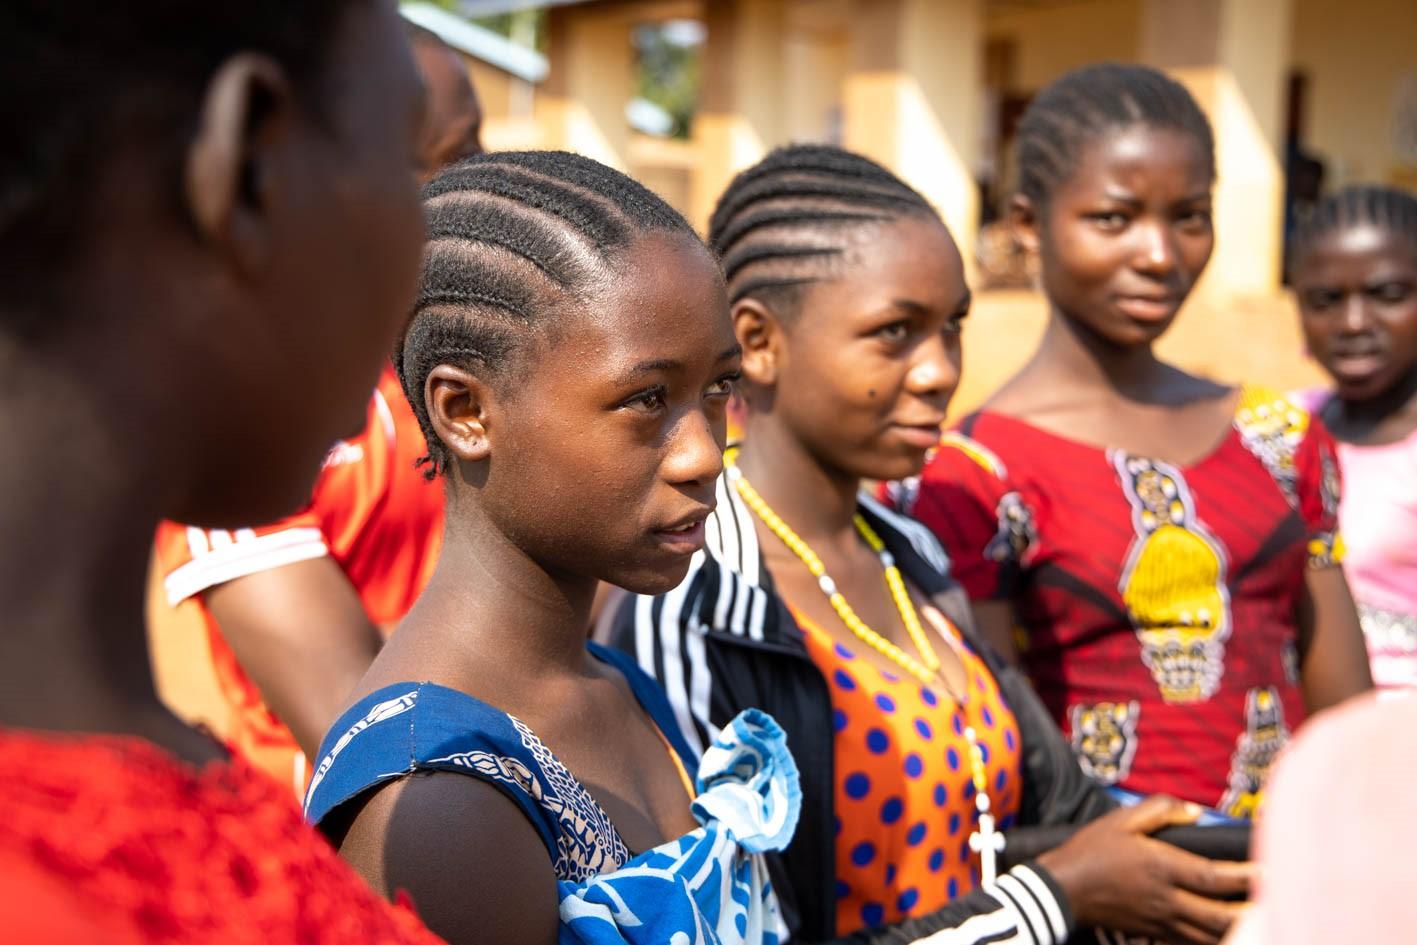 Menstrual hygiene matters for the girls in Nyarugusu refugee camp, Kigoma Region